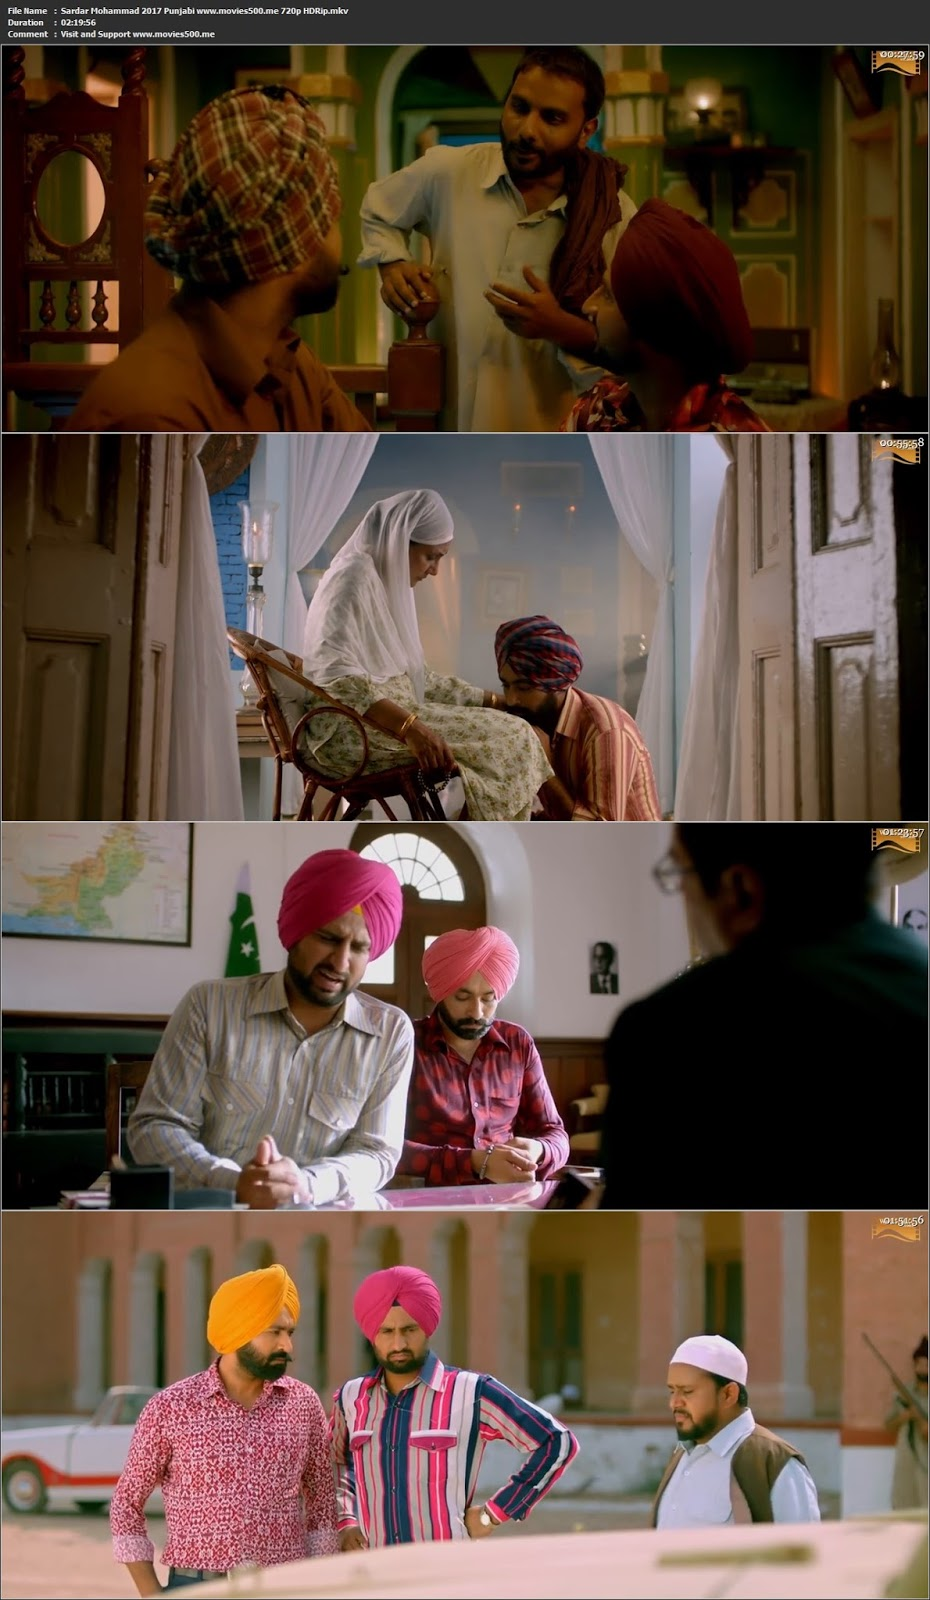 Sardar Mohammad 2017 Punjabi Full Movie HDRip 720p at sweac.org